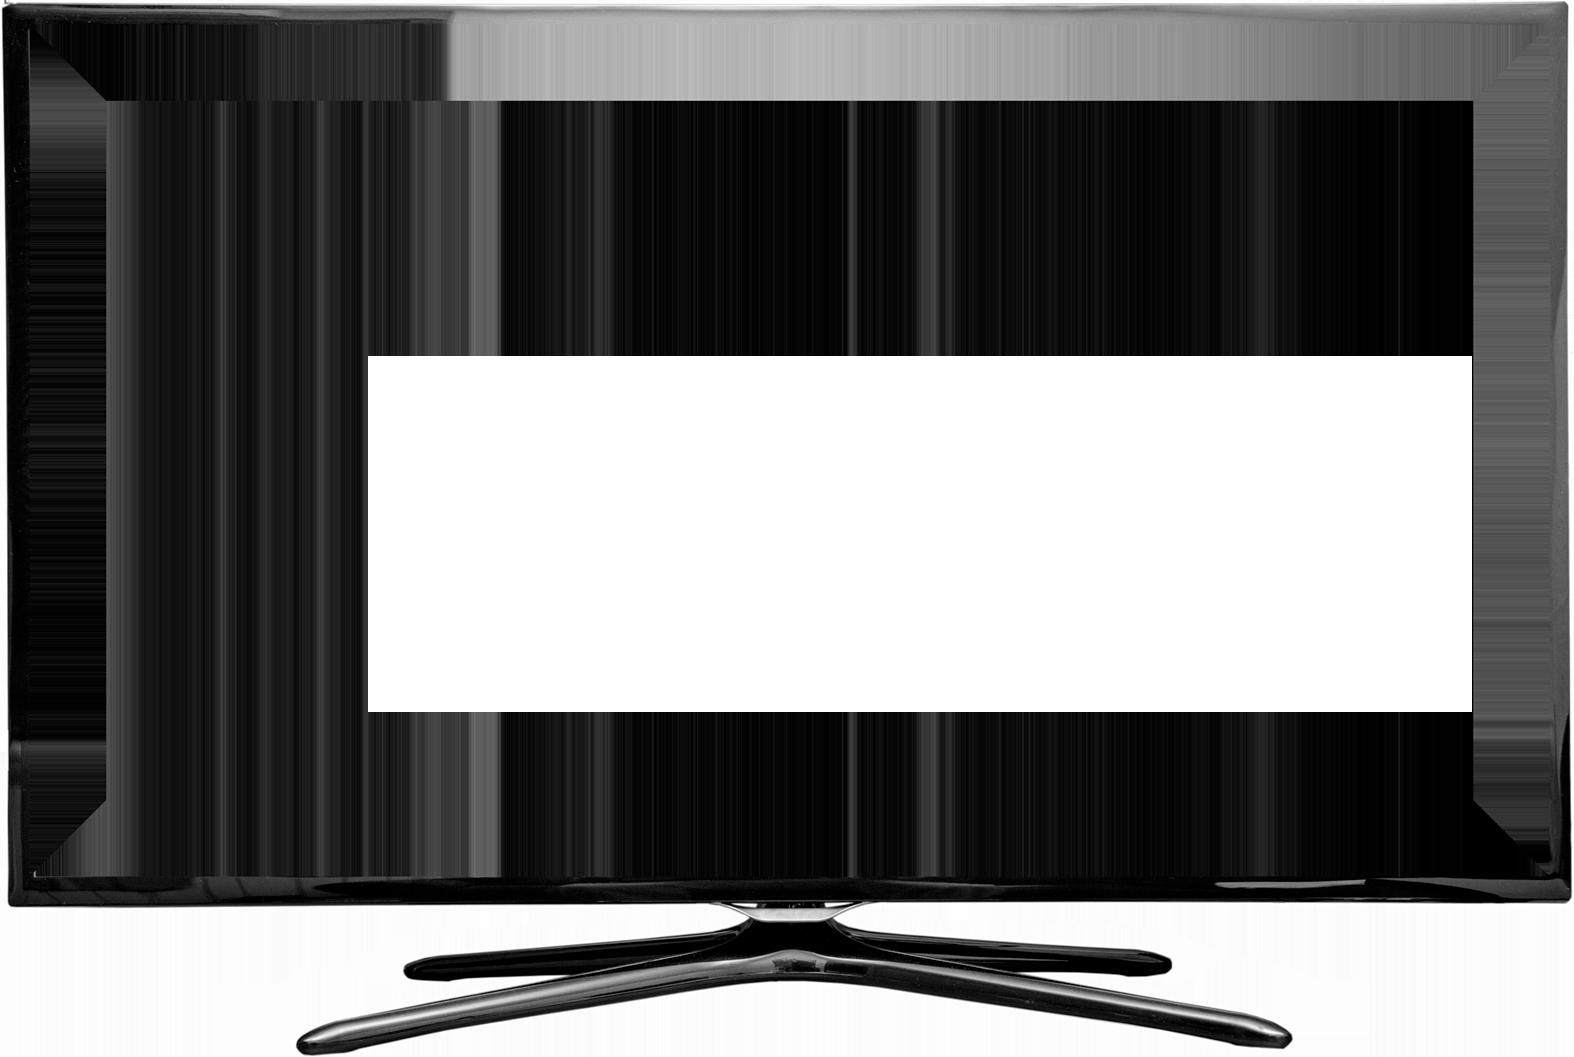 Led Television PNG Image - PurePNG | Free transparent CC0 PNG Image ...